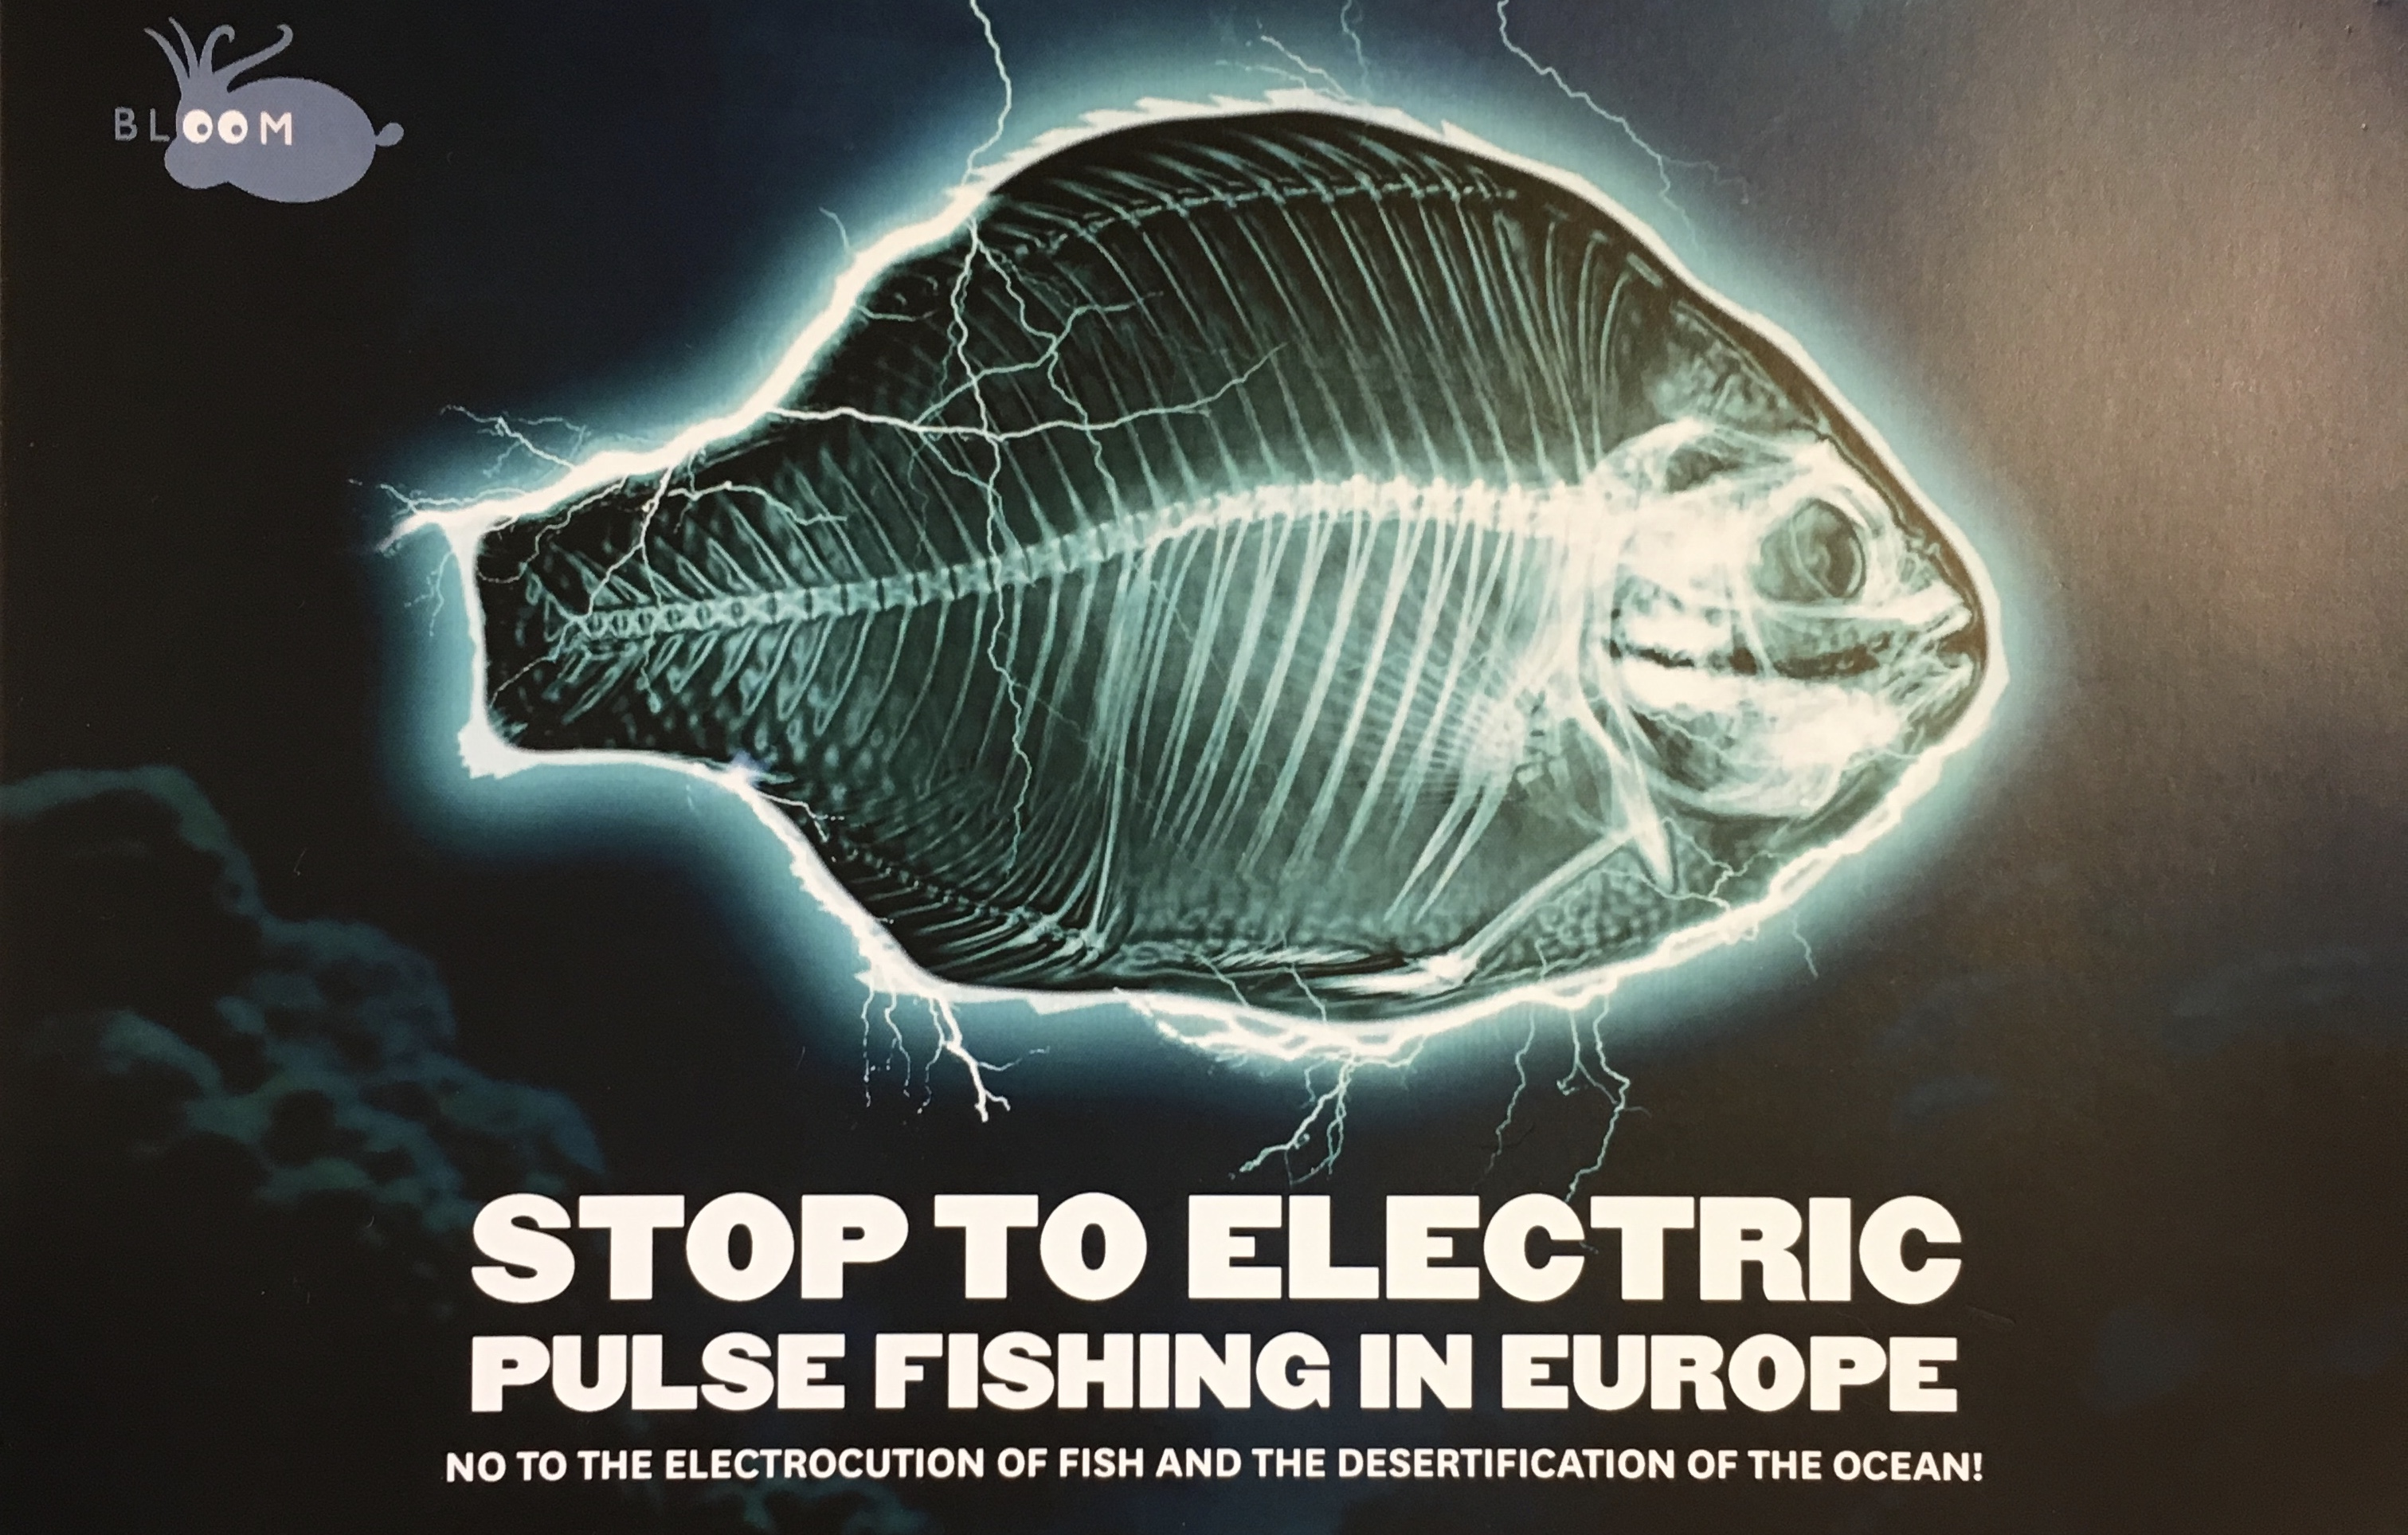 European Parliament Backs Ban on Pulse Fishing